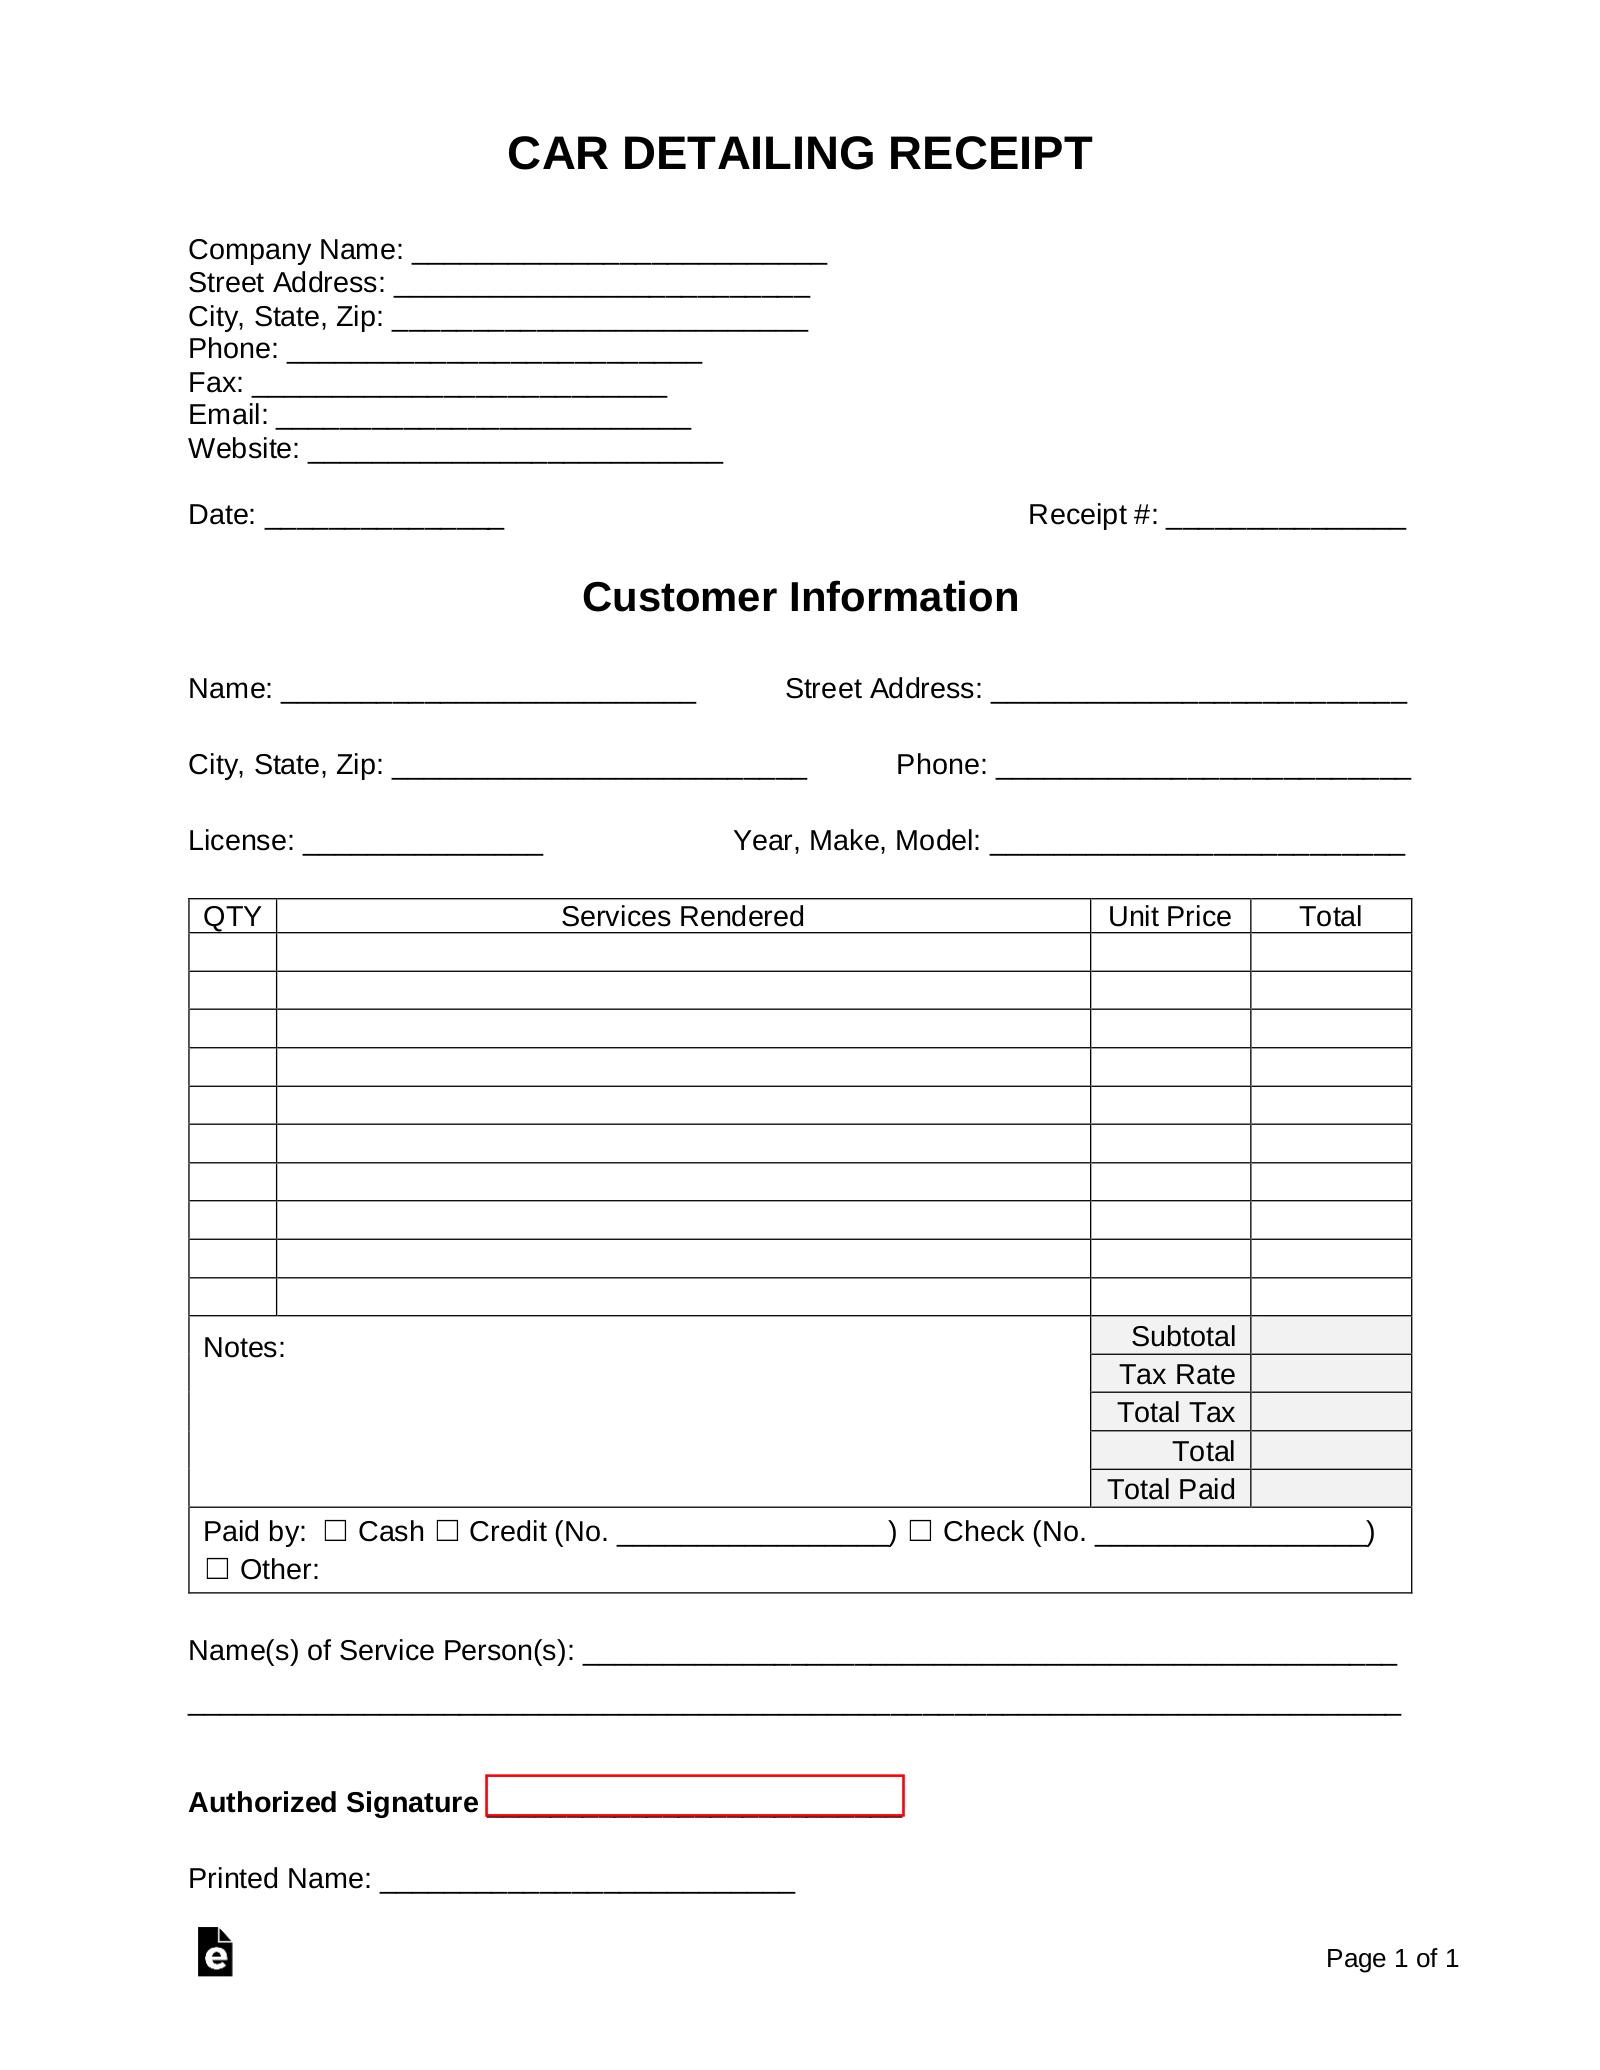 free car detailing receipt template pdf word eforms